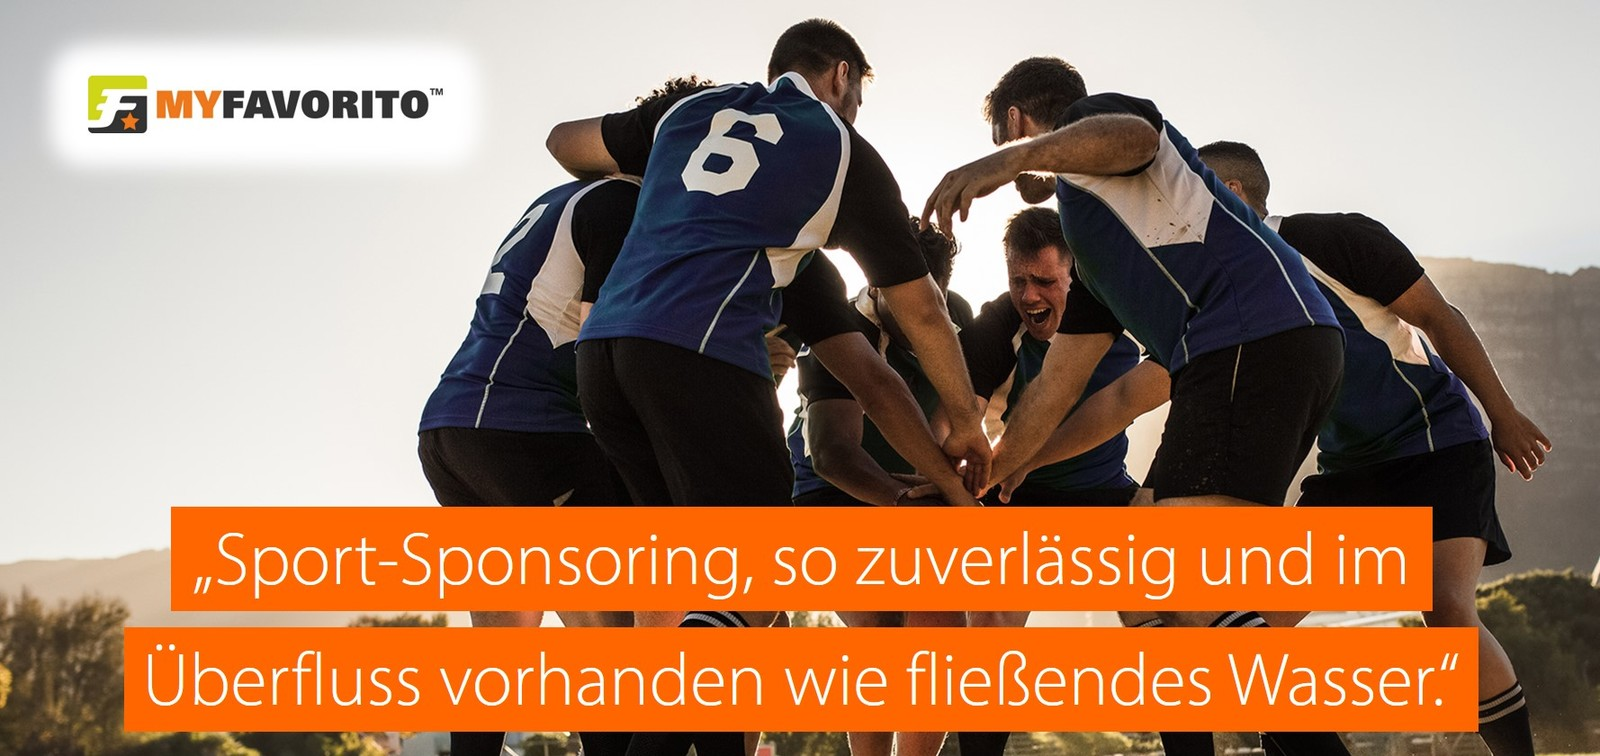 myfavorito sport sponsoring vision